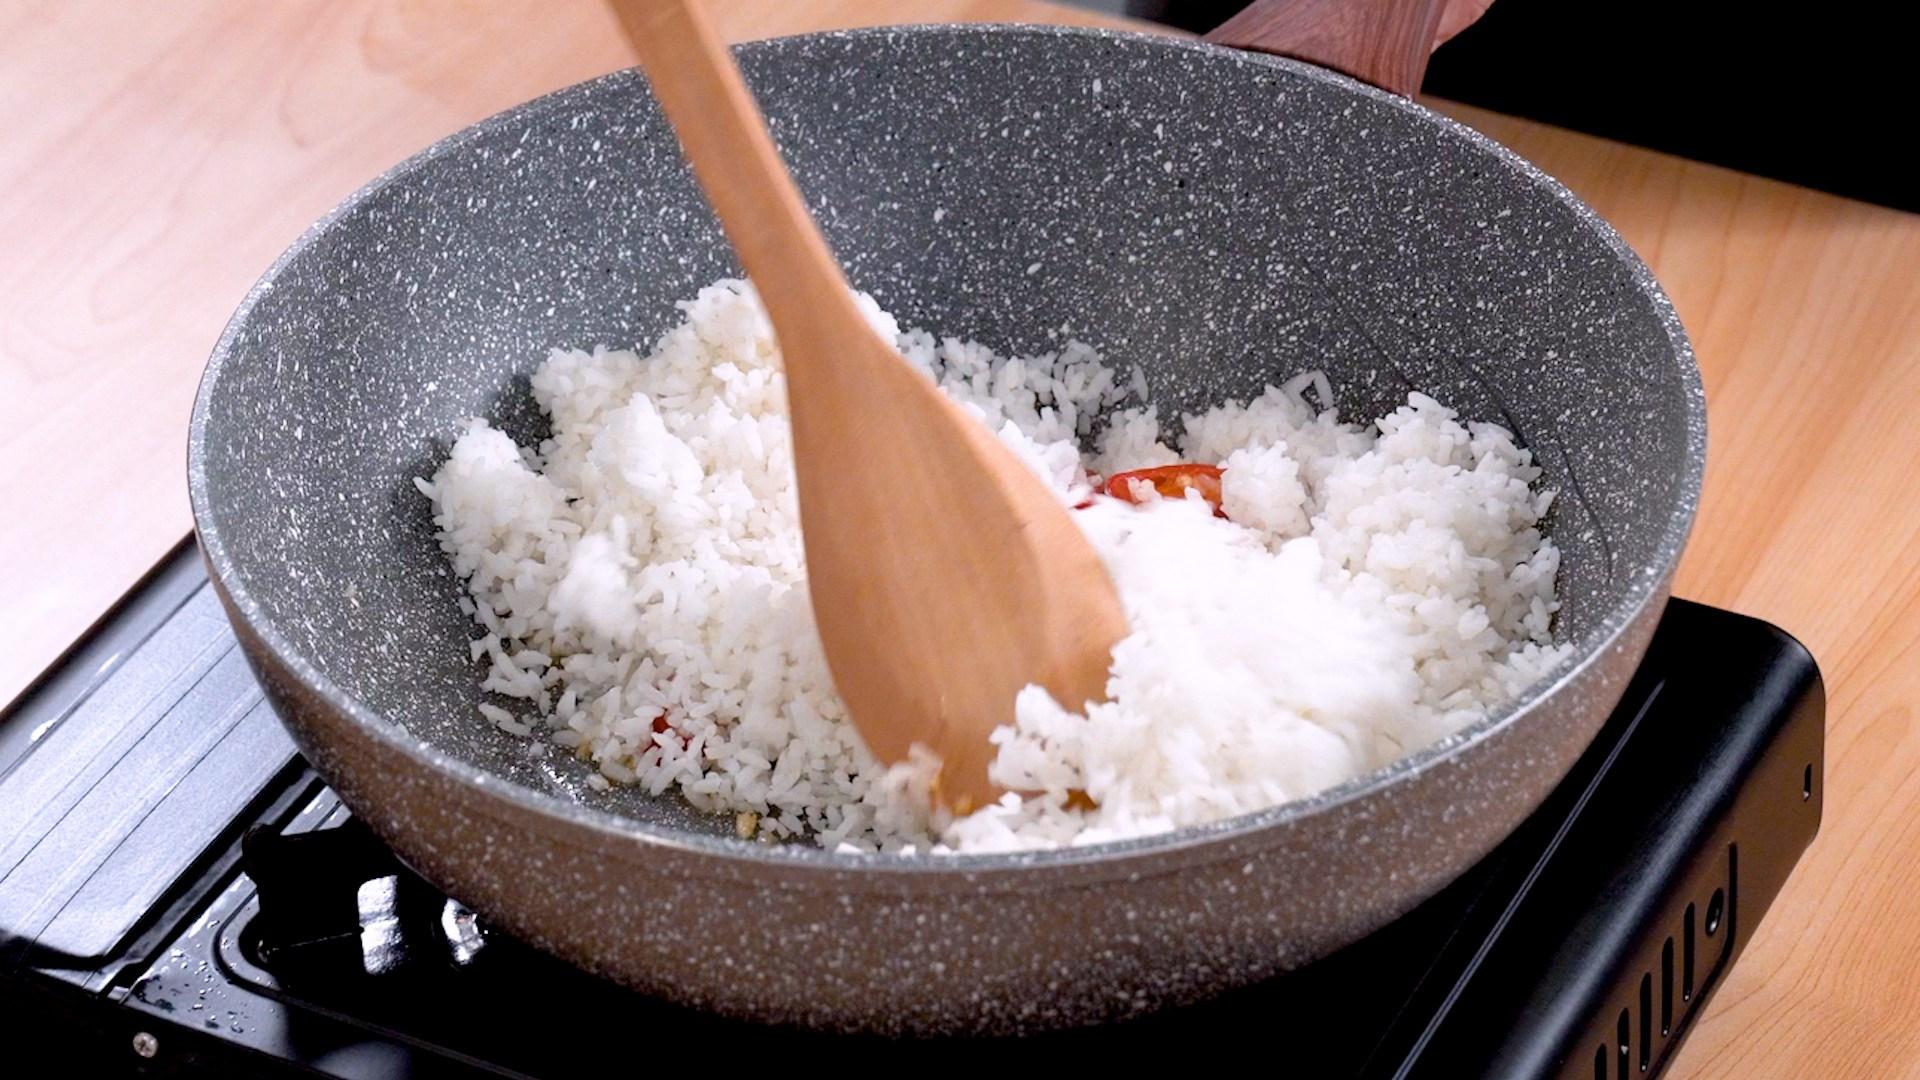 Membuat nasi goreng.